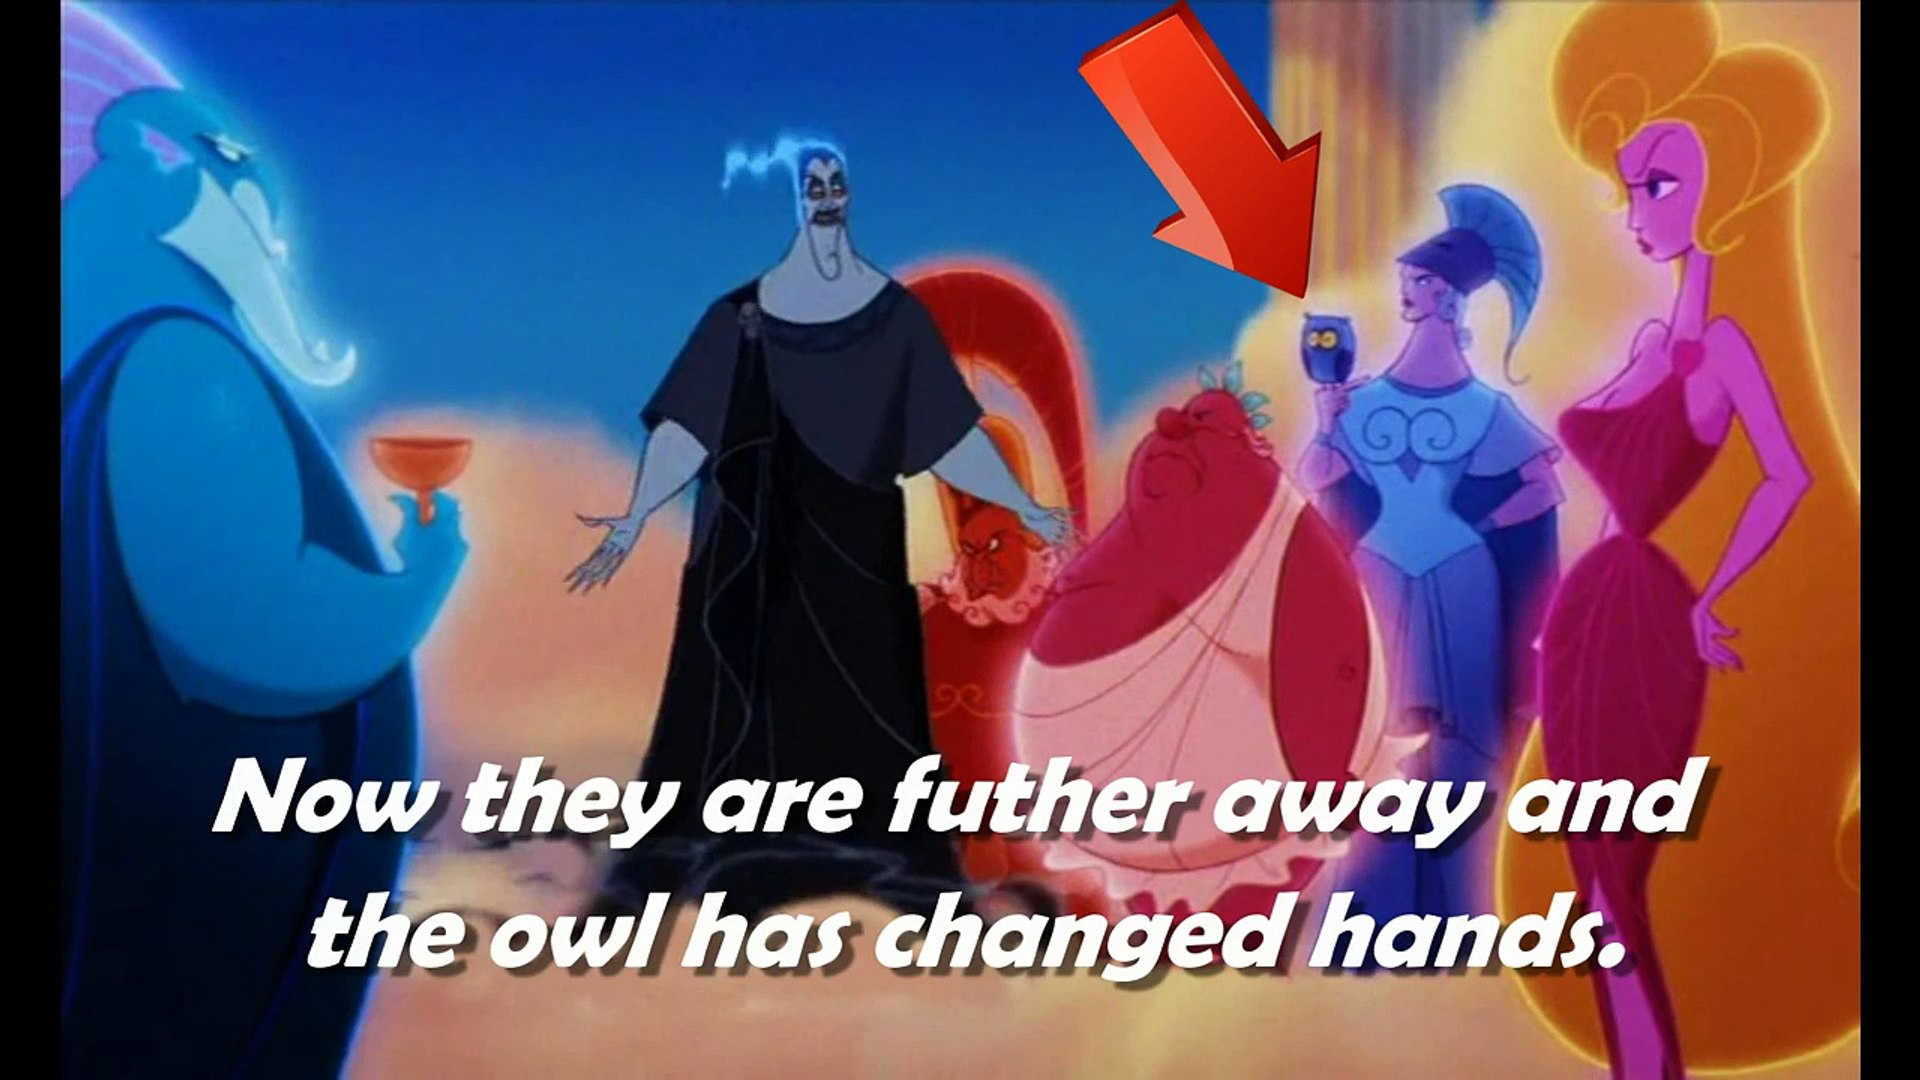 Disney Hercules Movie - MOVIE MISTAKES, Fails, Movie Clips and MOVIE MISTAKES